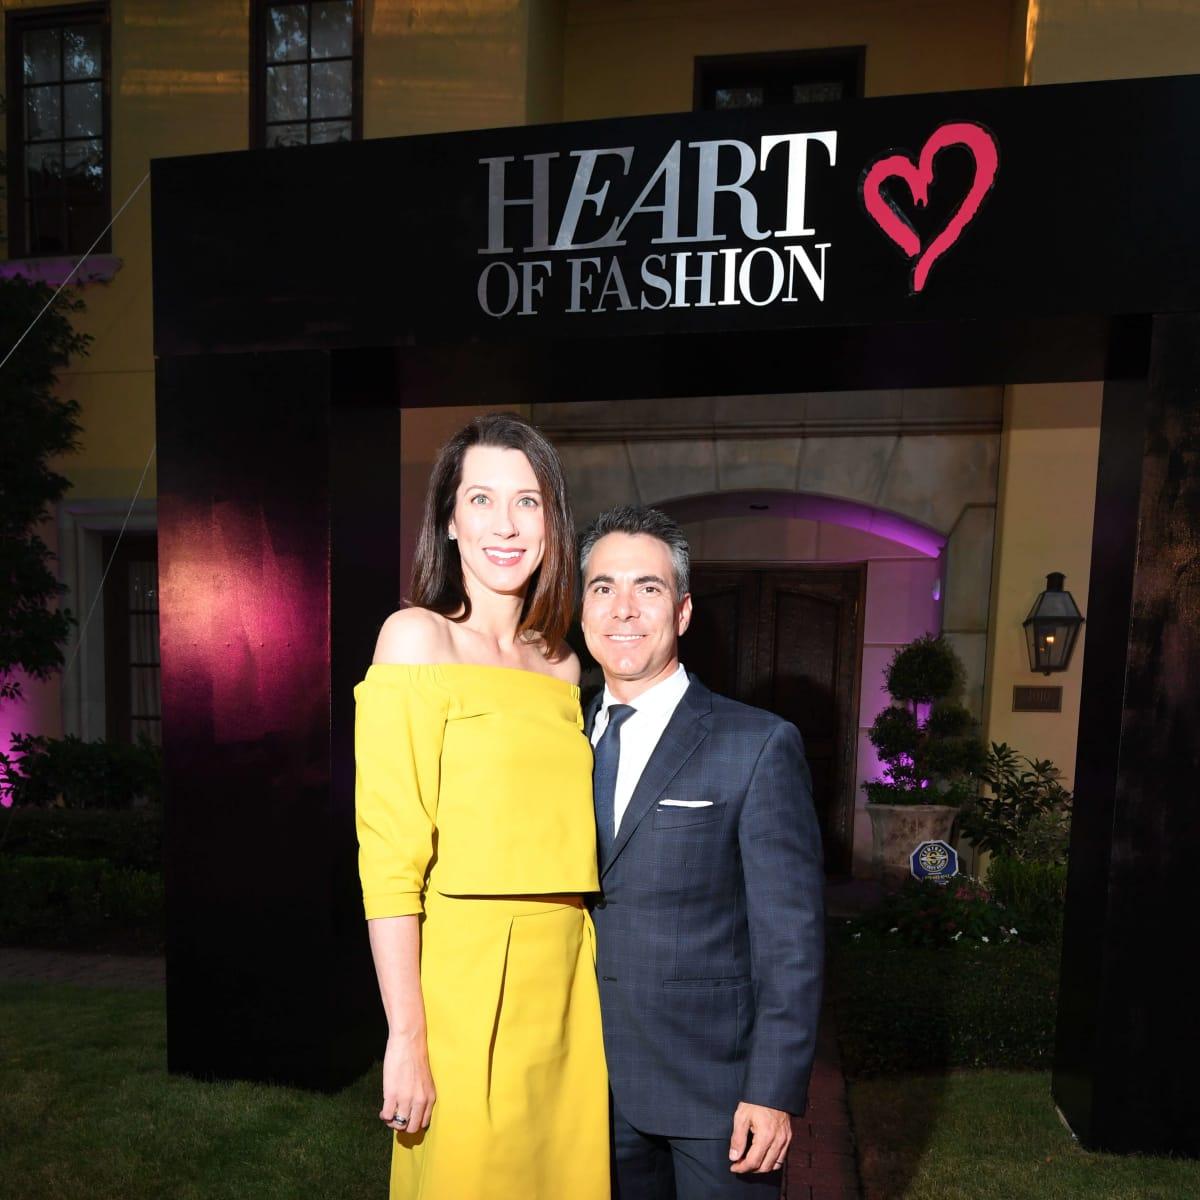 Heart of Fashion Laura Jones, Steve Jones